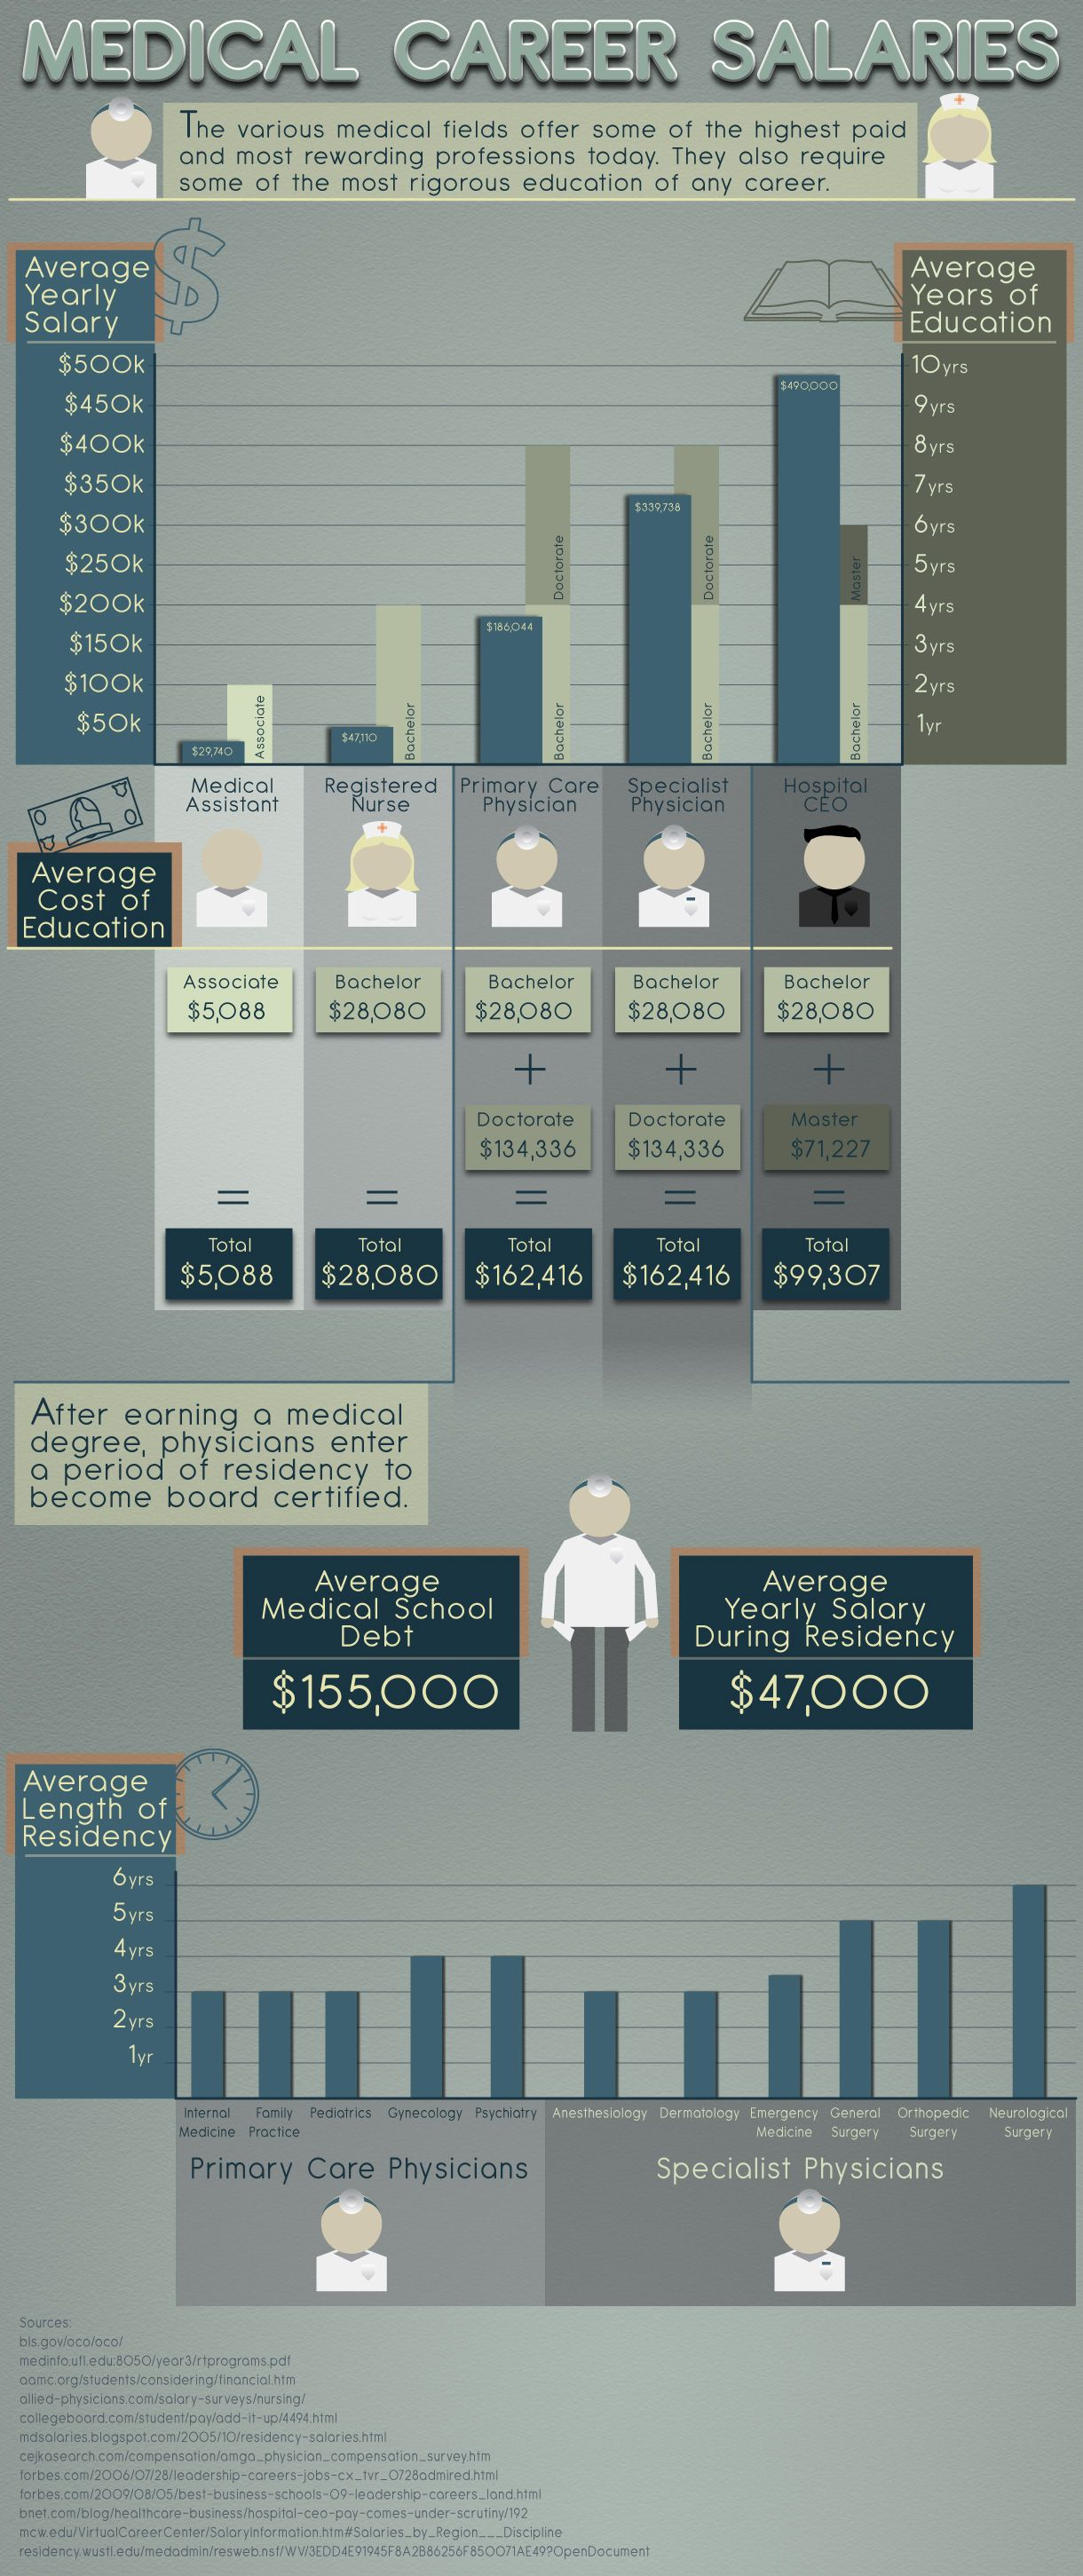 Medical career salaries medical careers medical jobs